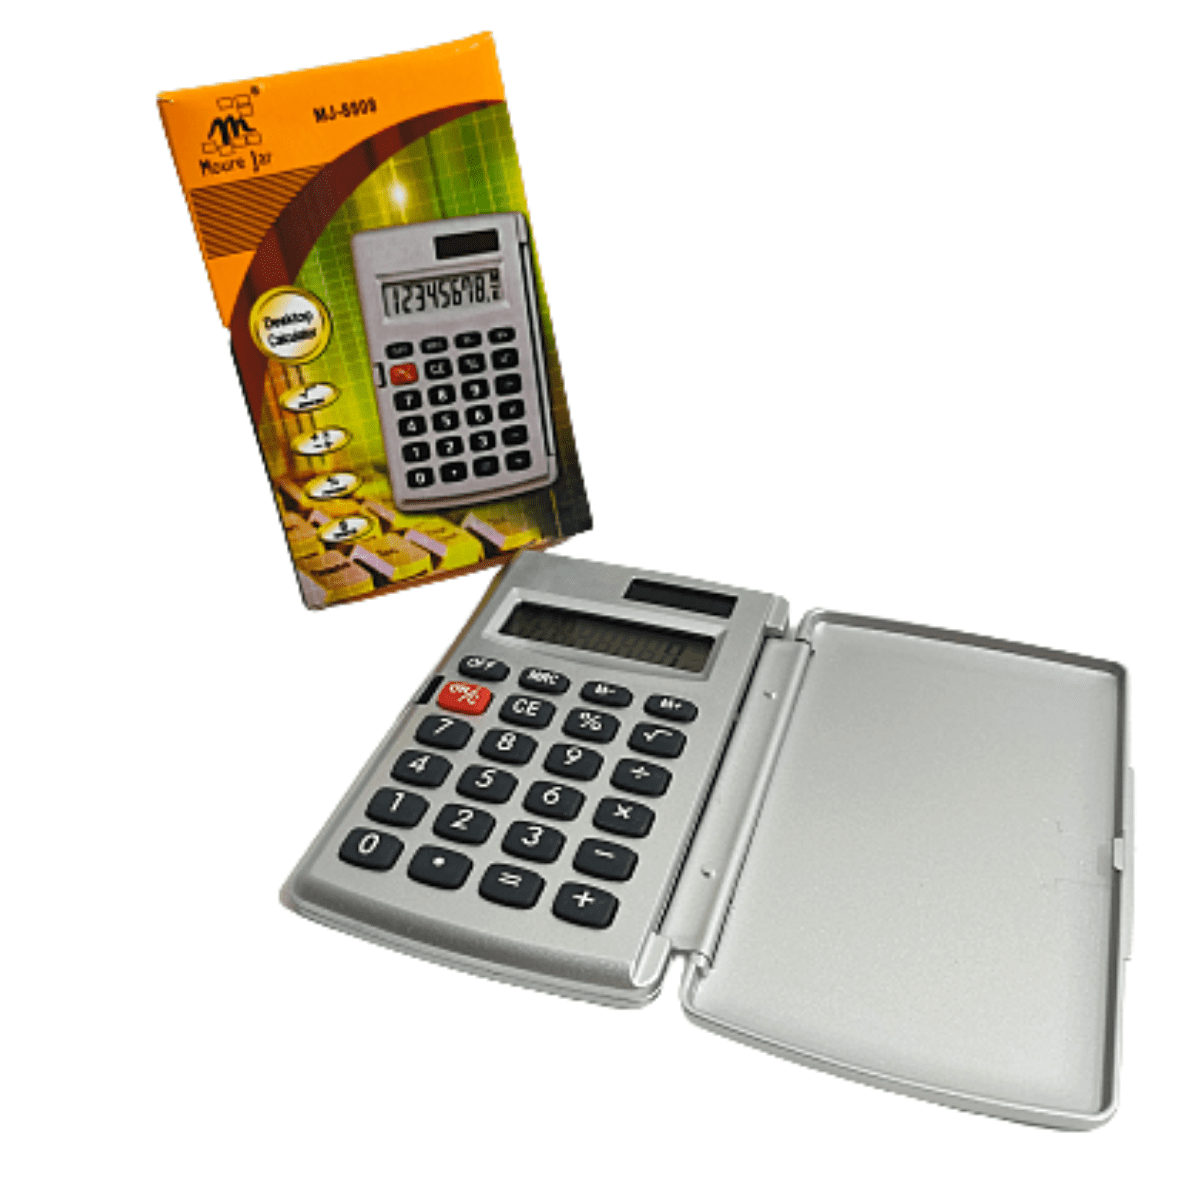 Calculadora Portátil Mini Eletônica Cinza com Capa Mj - 8808